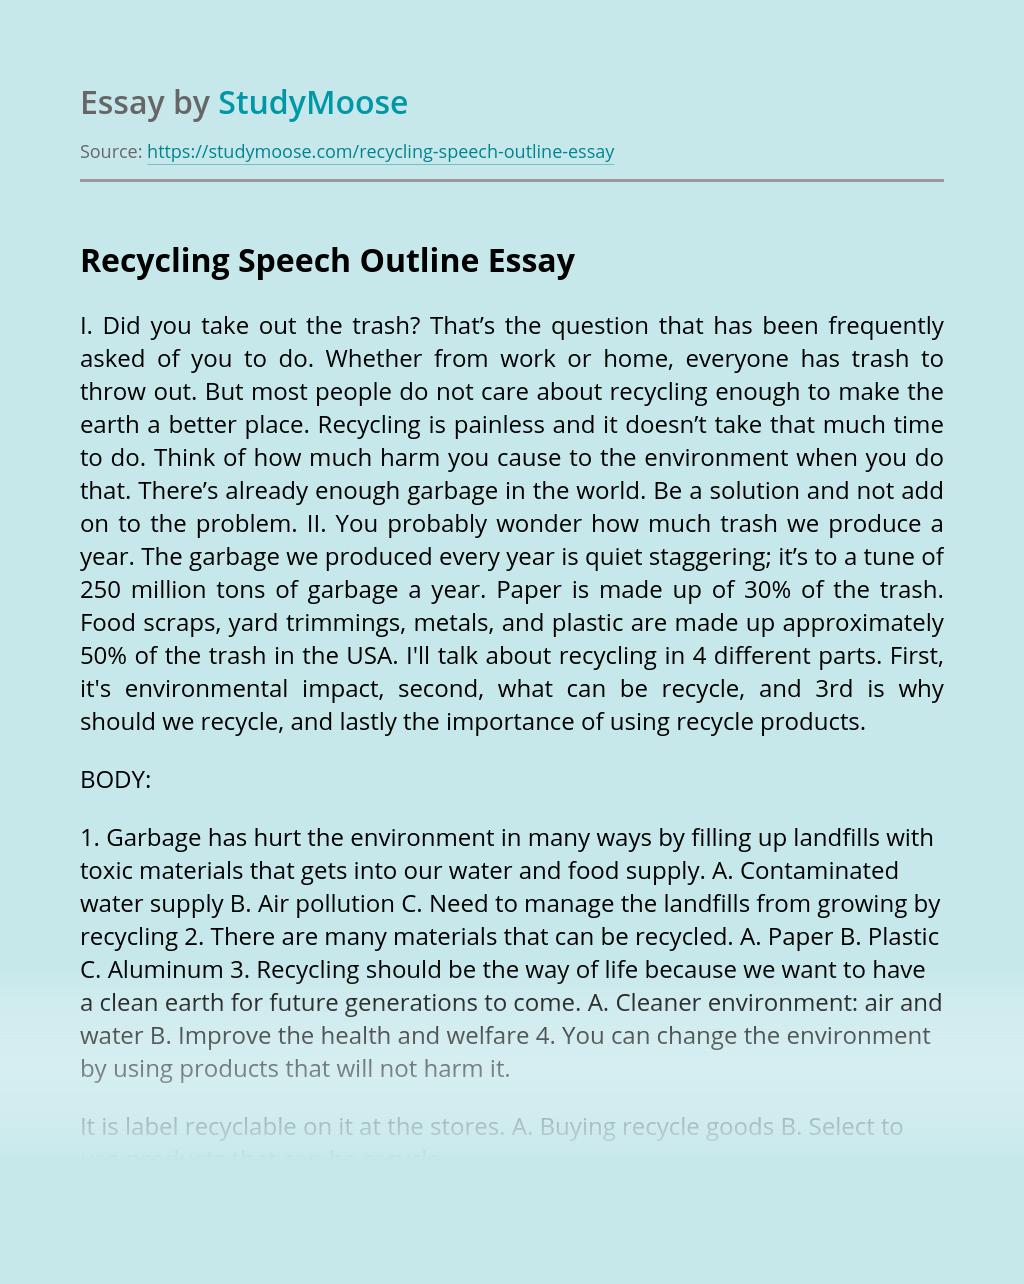 Recycling Speech Outline